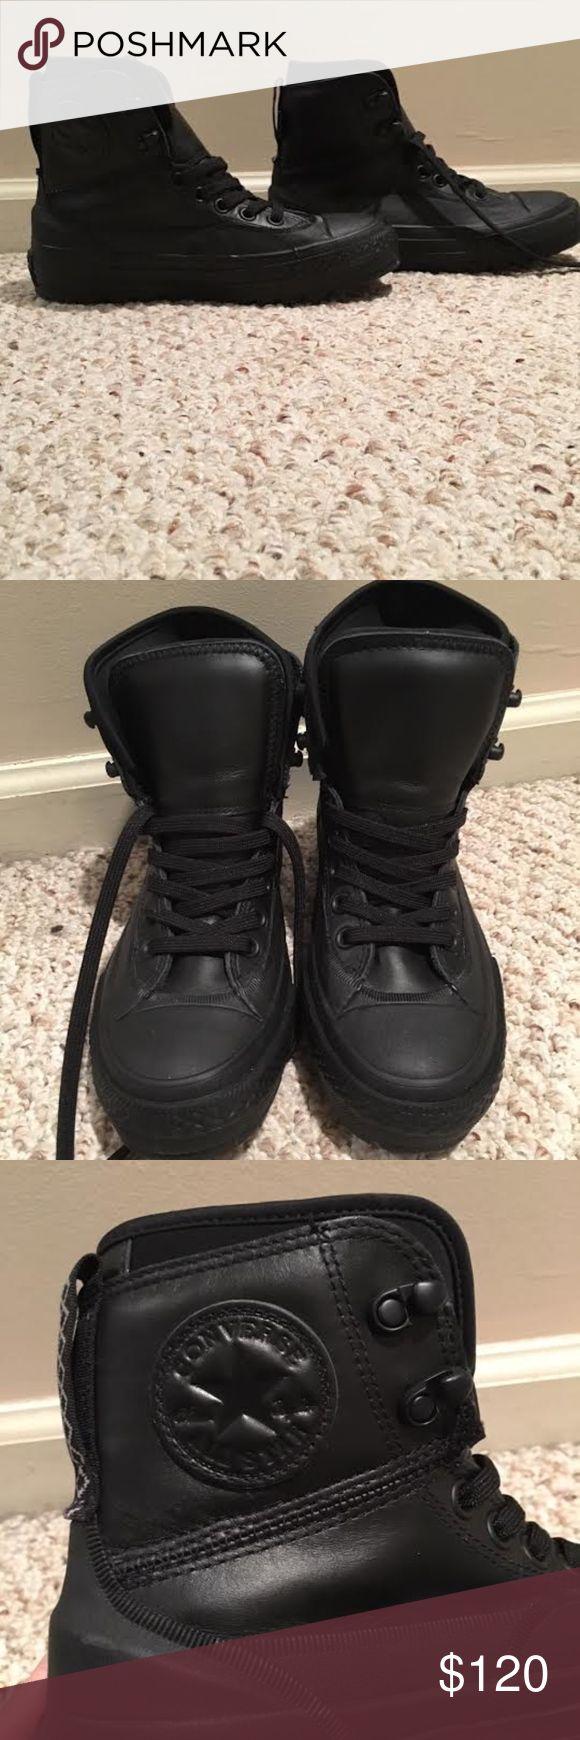 *BRAND NEW* Converse Tekoa Boots UNISEX, NEVER WORN, BLACK, WATER RESISTANT Men's 6, Women's 7.5 Converse Shoes Winter & Rain Boots